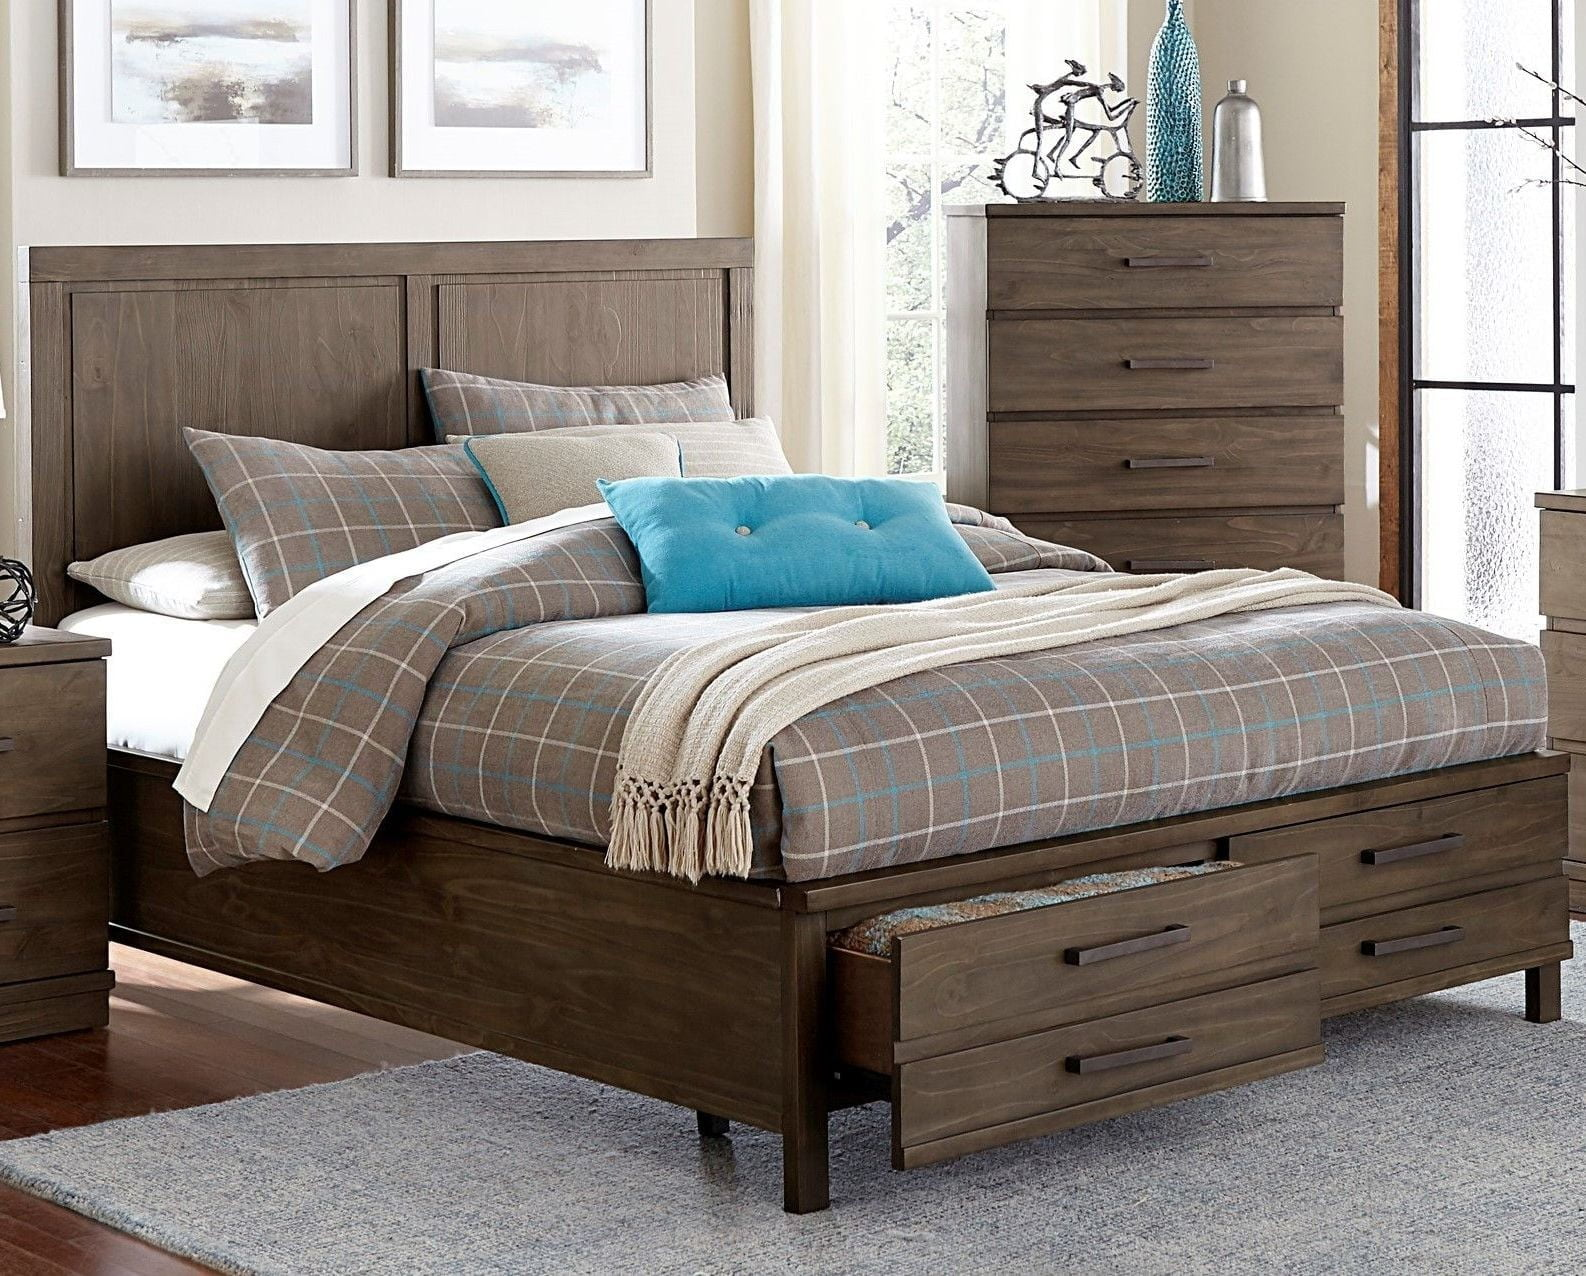 Bracco brown cal king platform storage bed from - California king storage bedroom sets ...